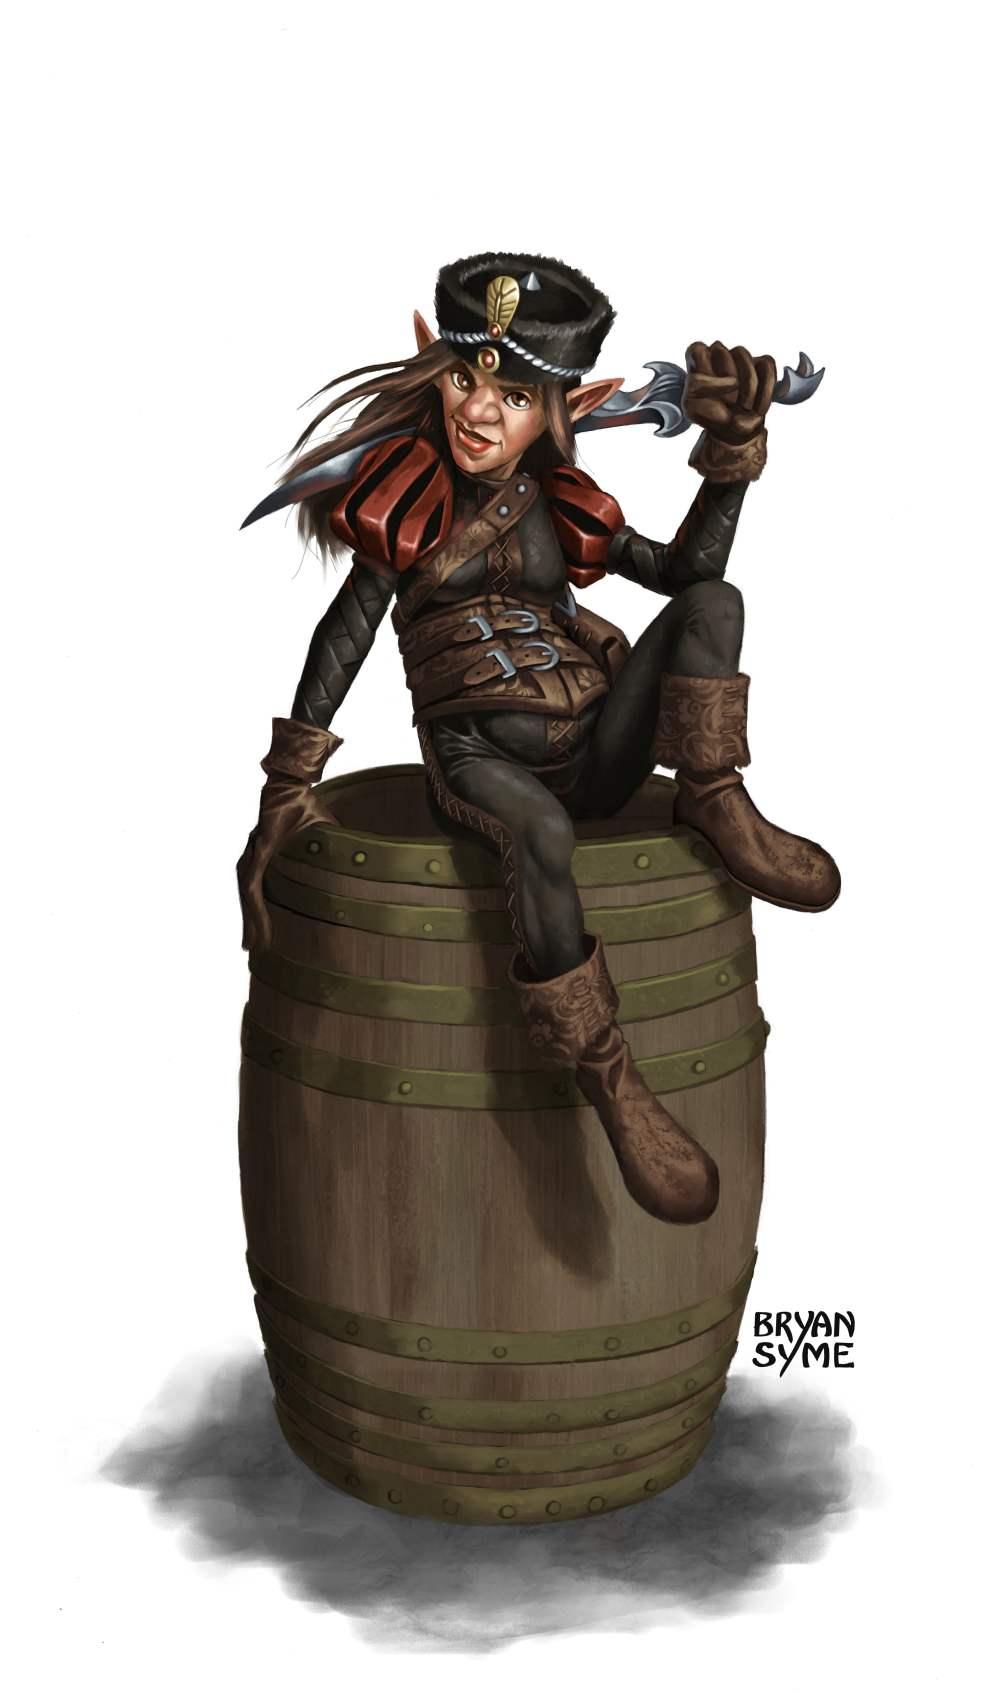 Hoard of the dragon queen pdf 5e